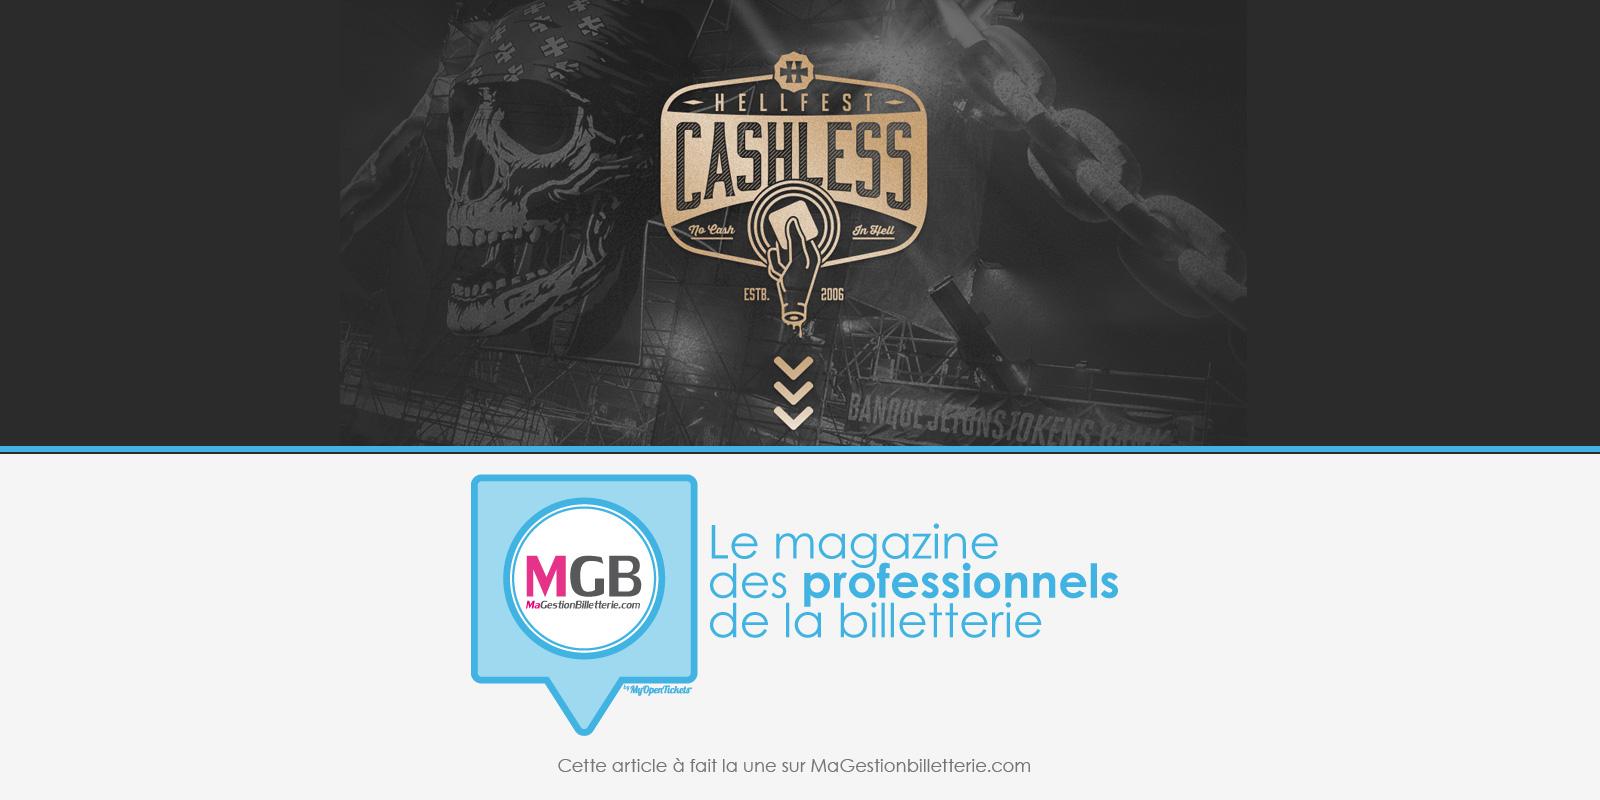 hellfest-cashless-reportage-une4